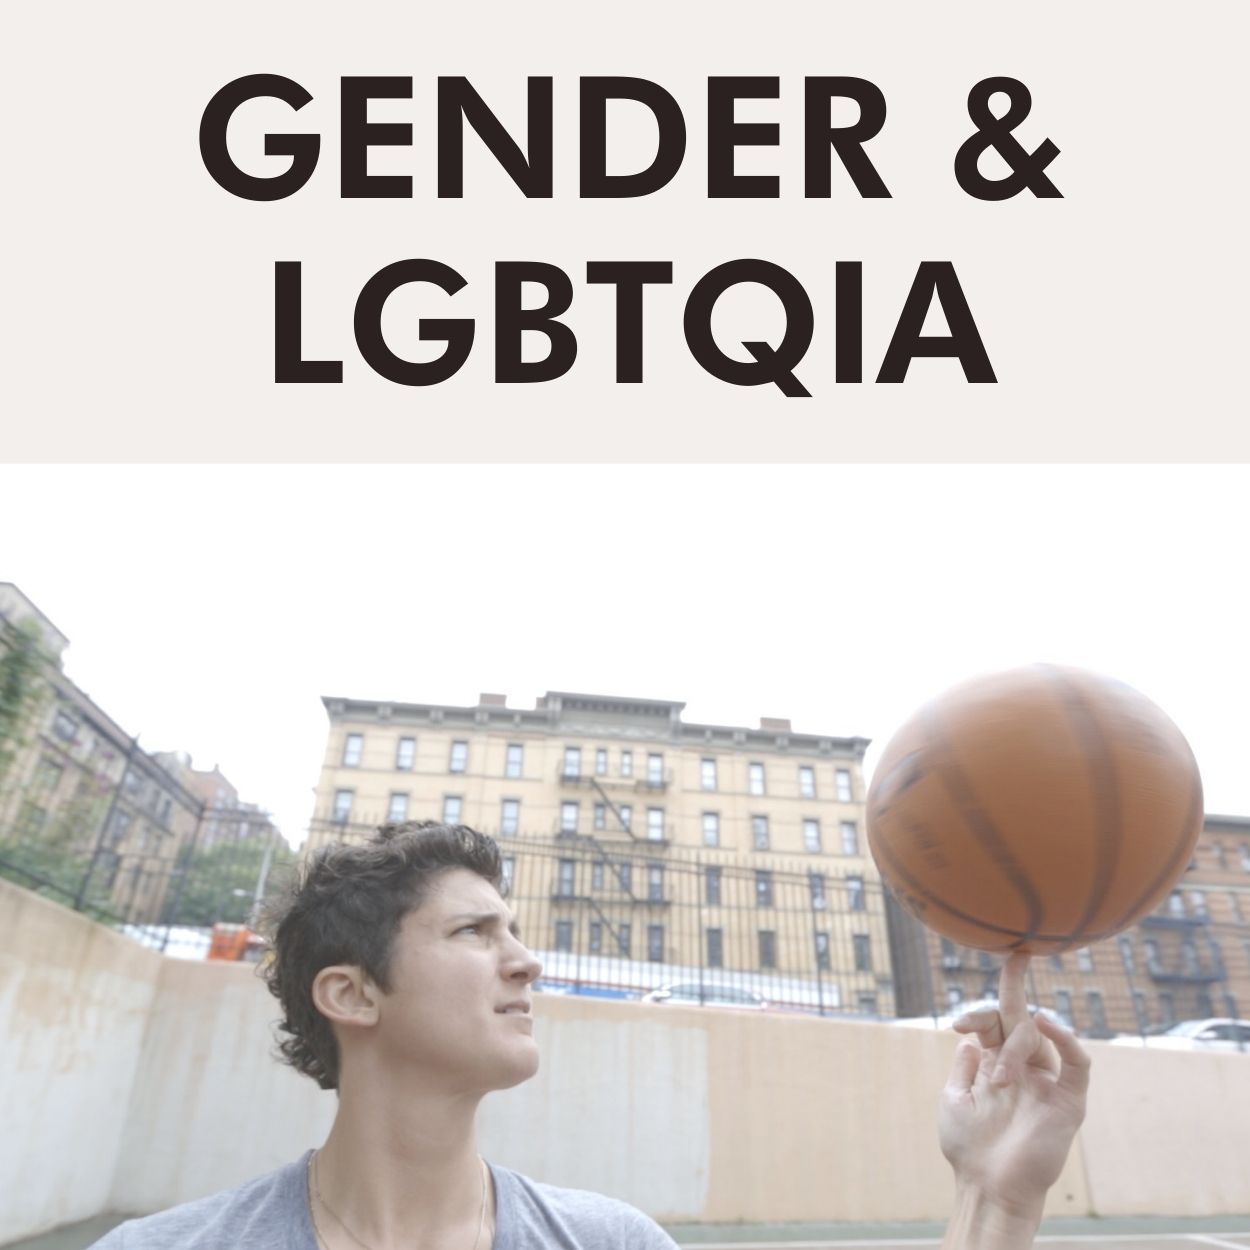 GENDER & LGBTQ+ (4)